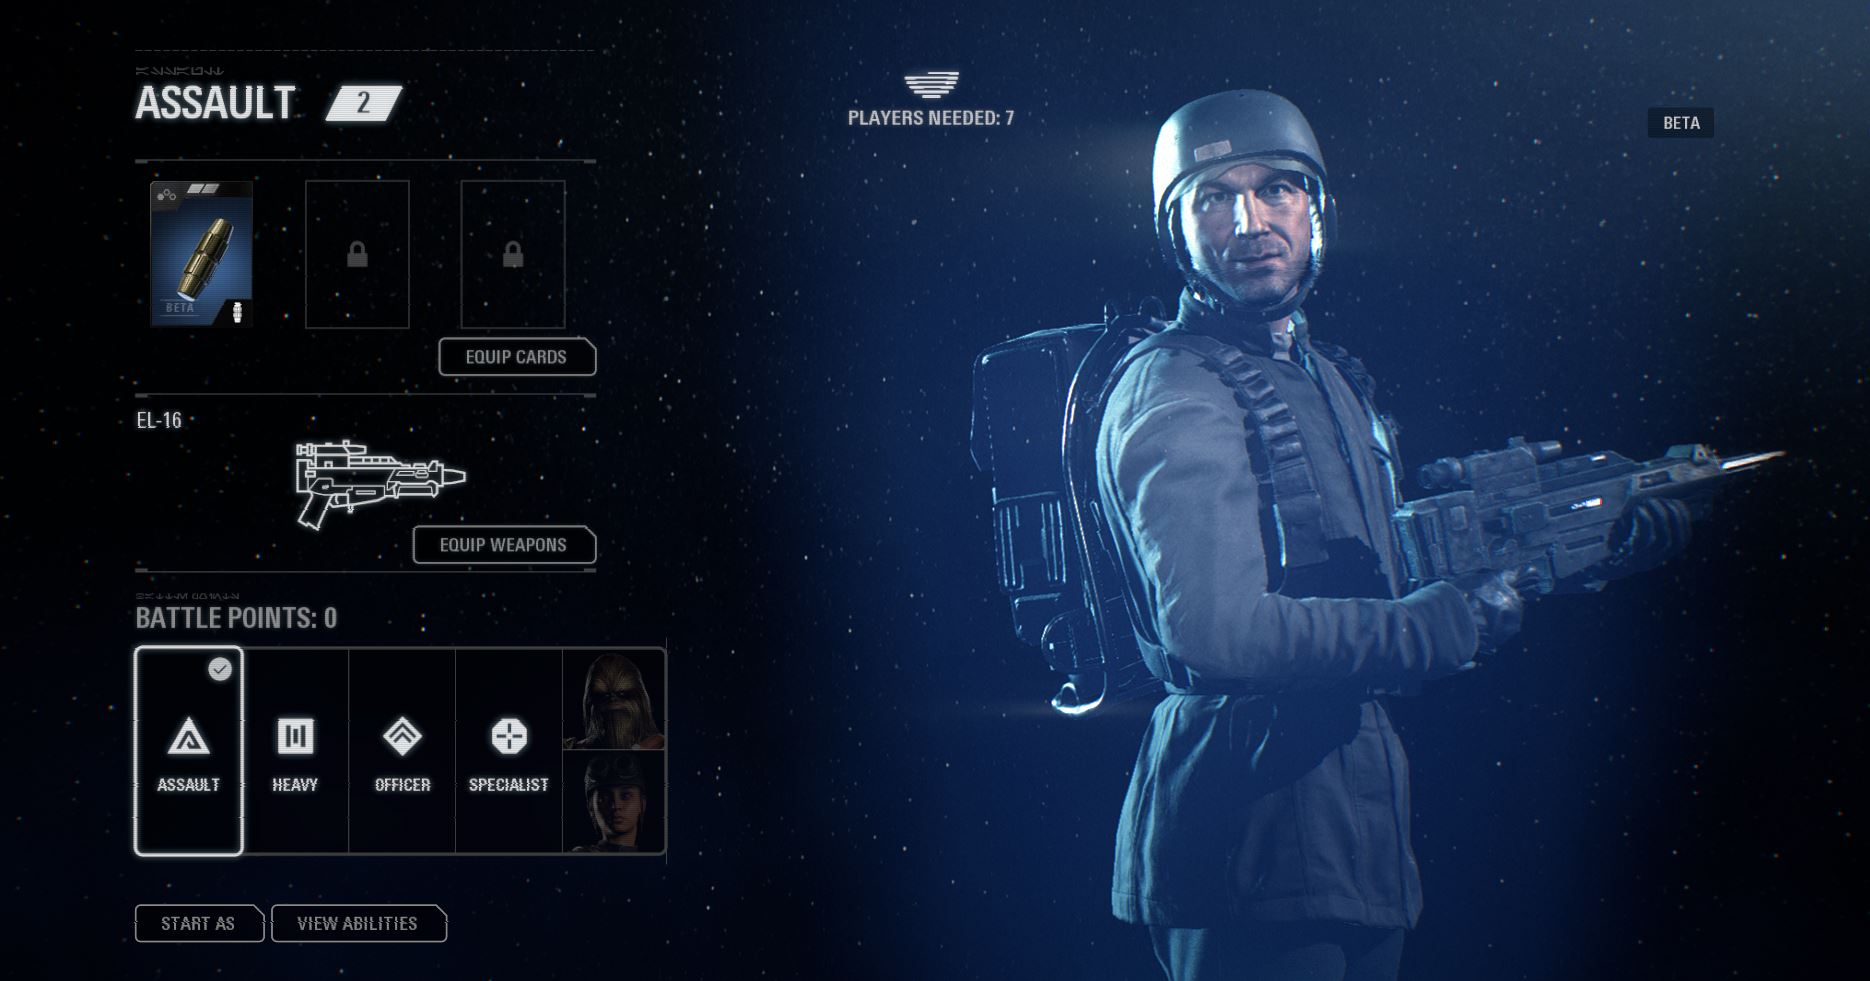 star wars battlefront 2 beta generalites